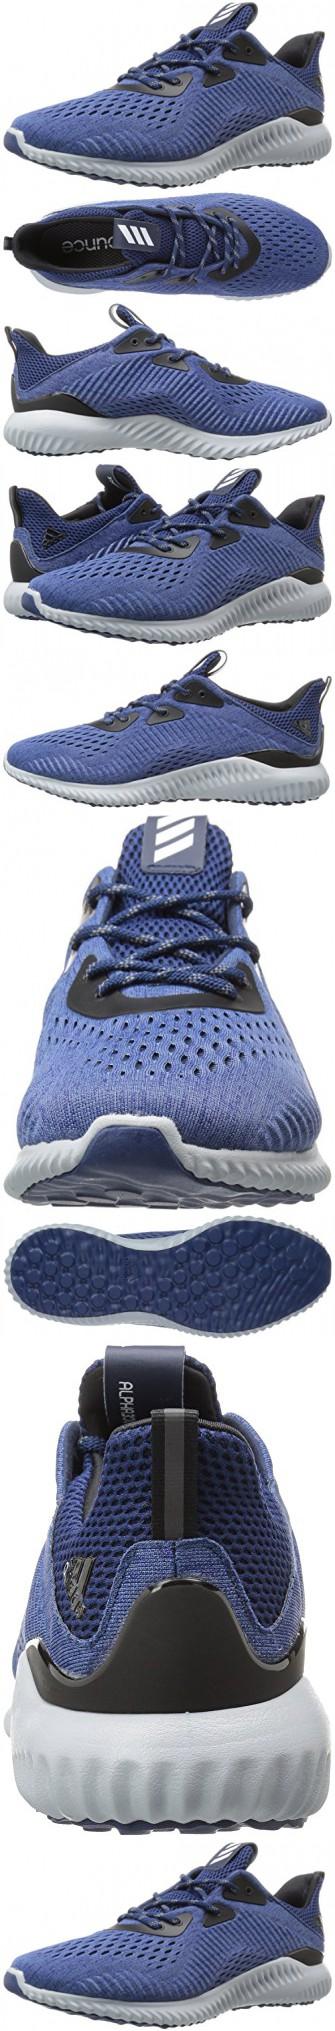 Adidas Performance Men S Alphabounce Em M Running Shoe Collegiate